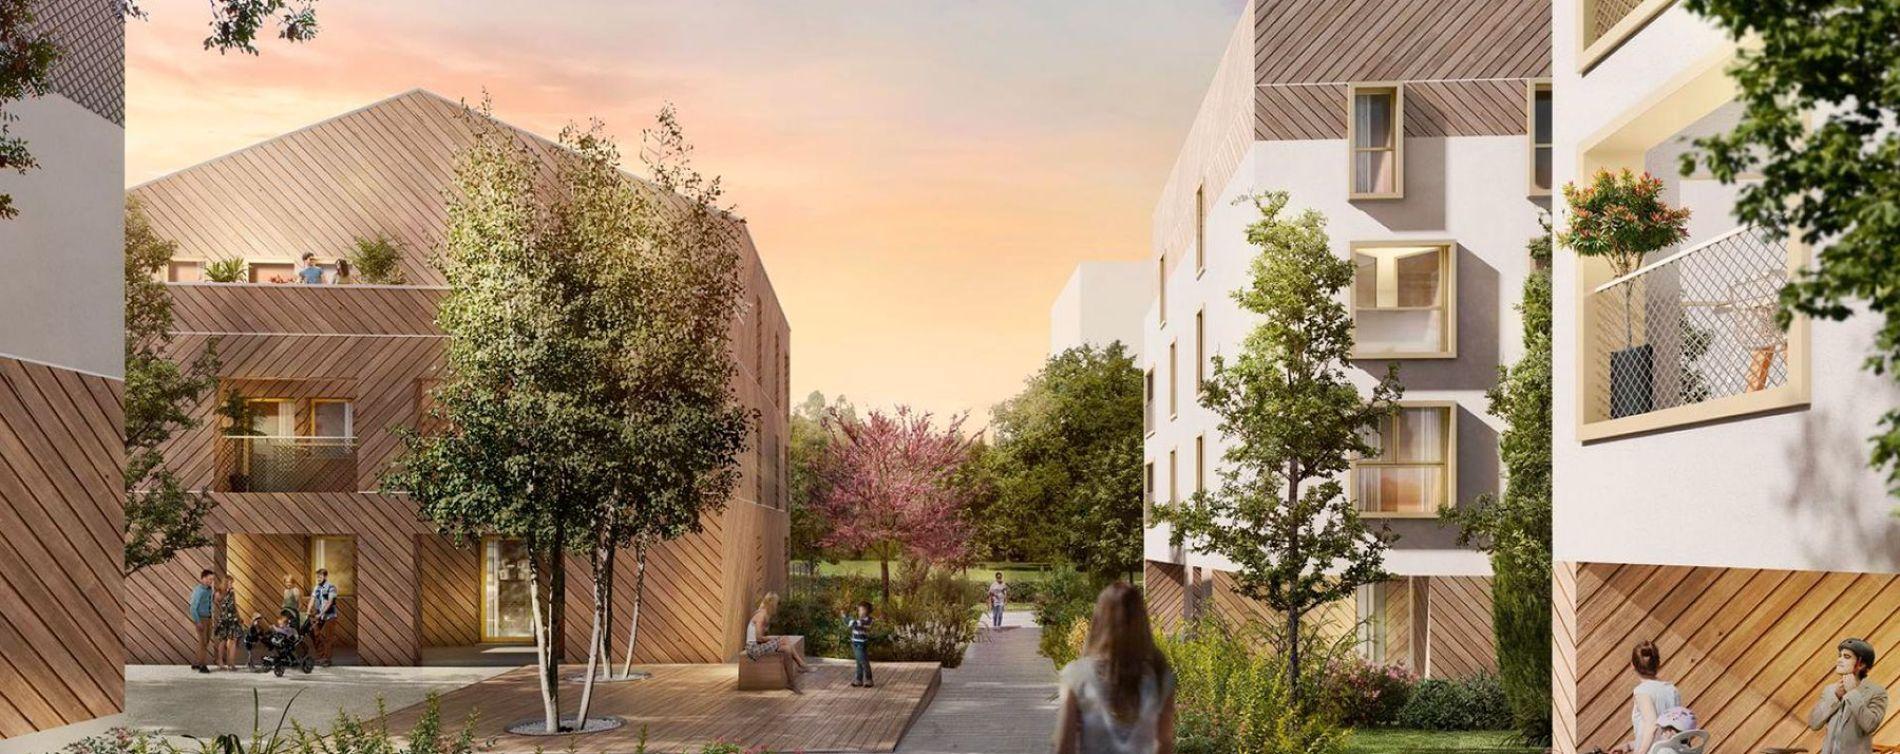 Couëron : programme immobilier neuve « Programme immobilier n°215071 »